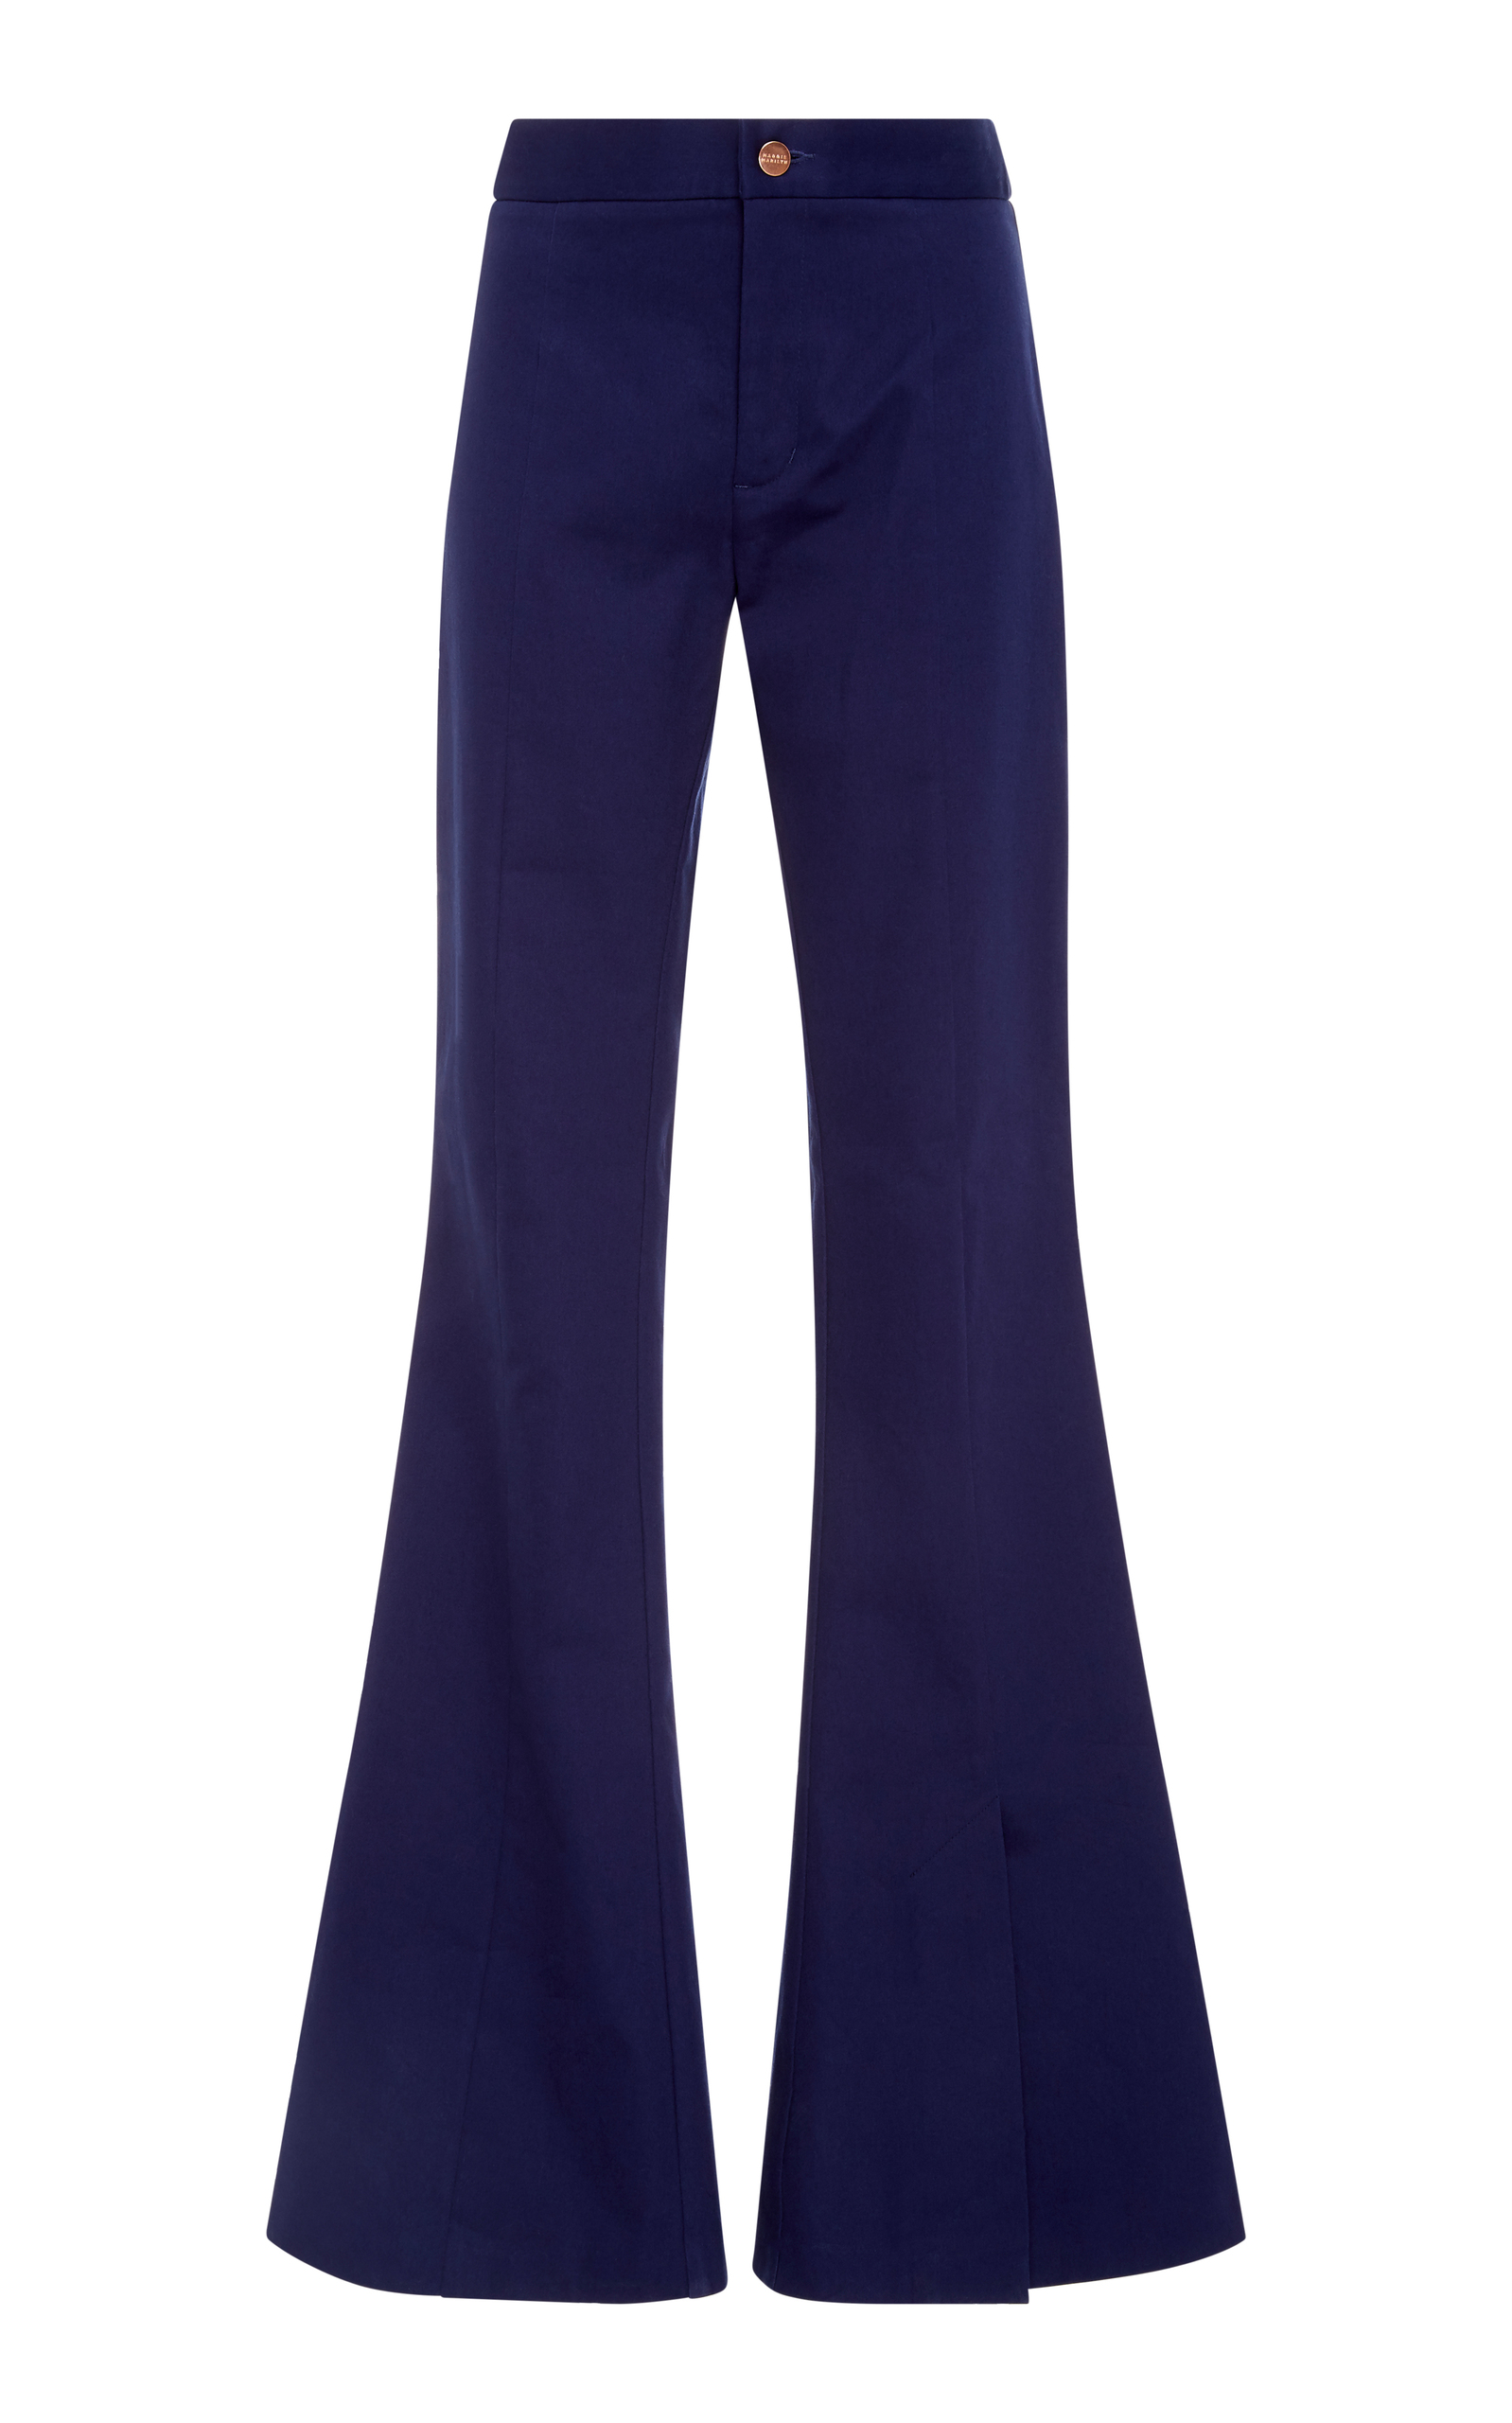 Shes Still A Dreamer trousers - Blue Maggie Marilyn CSKJaCH